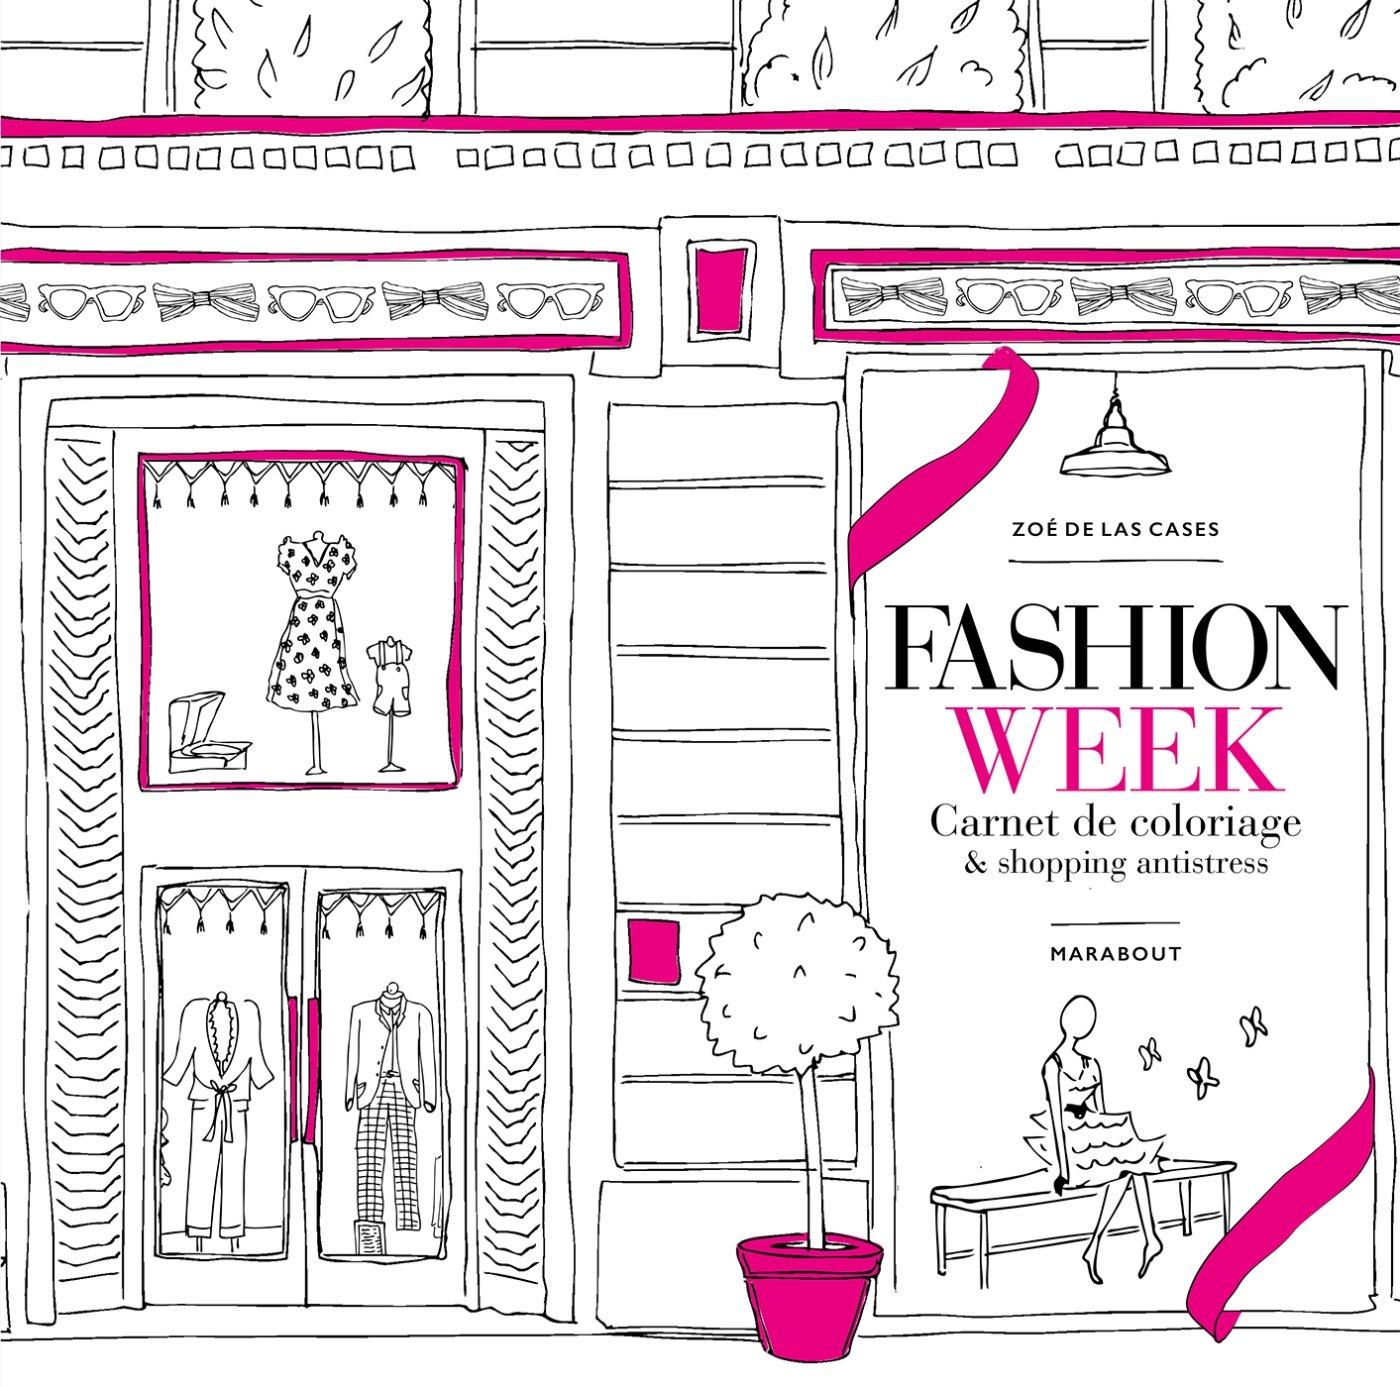 Fashion week : Carnet de coloriage & shopping antistress